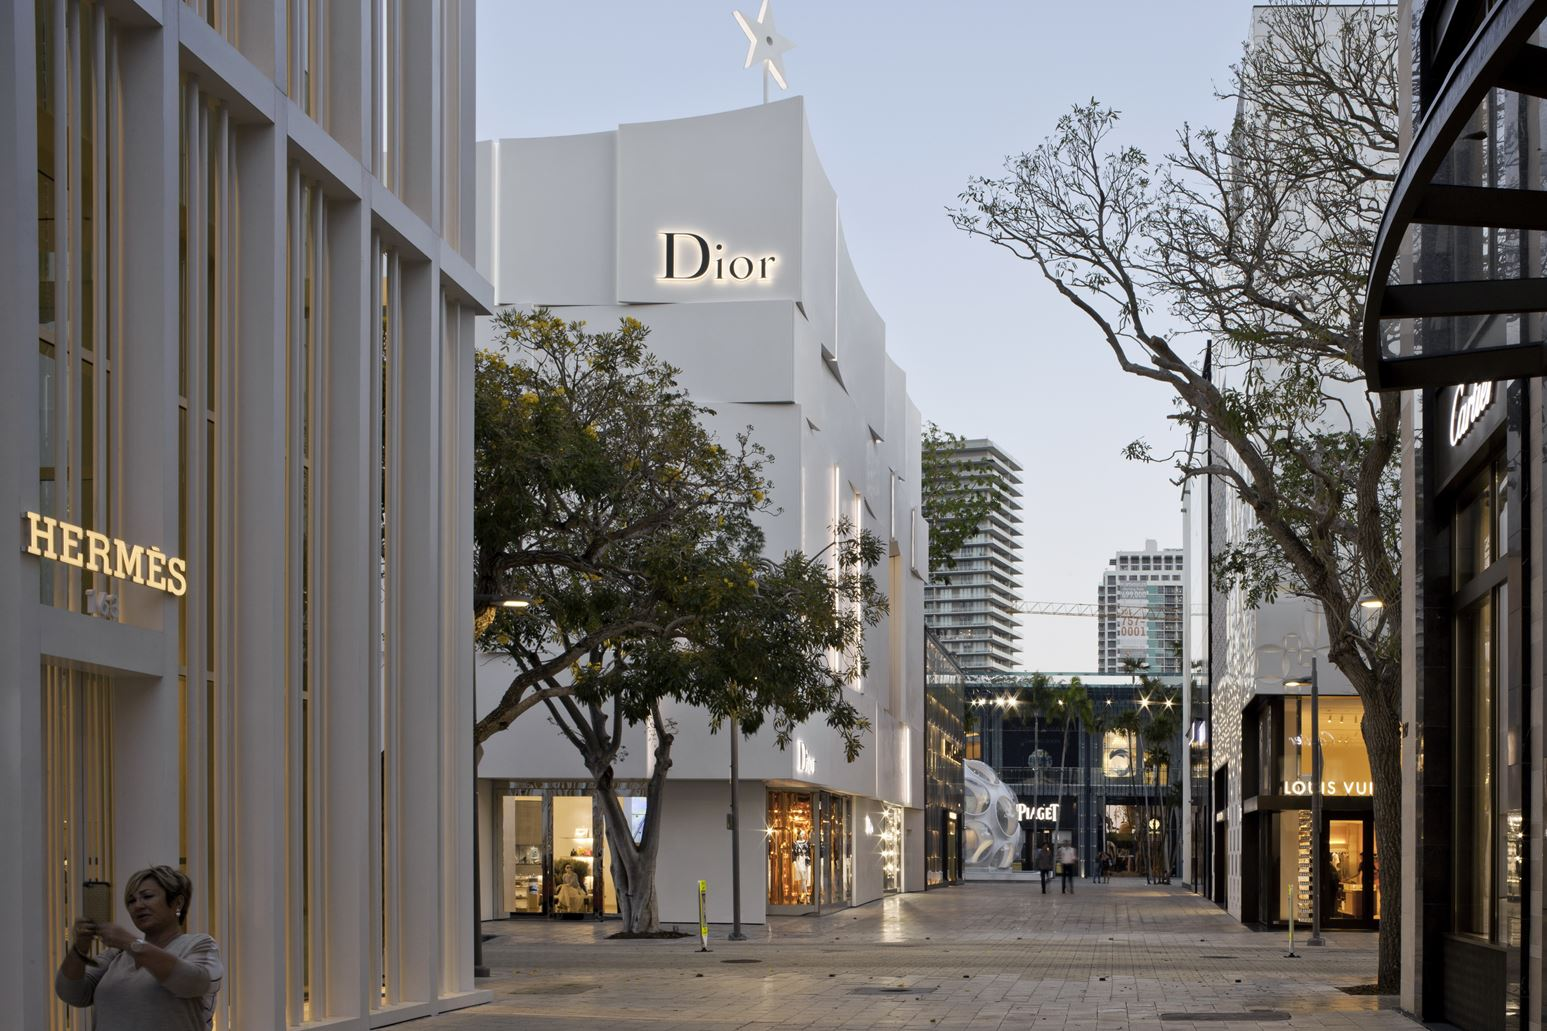 Dior Flagship Store in Miami